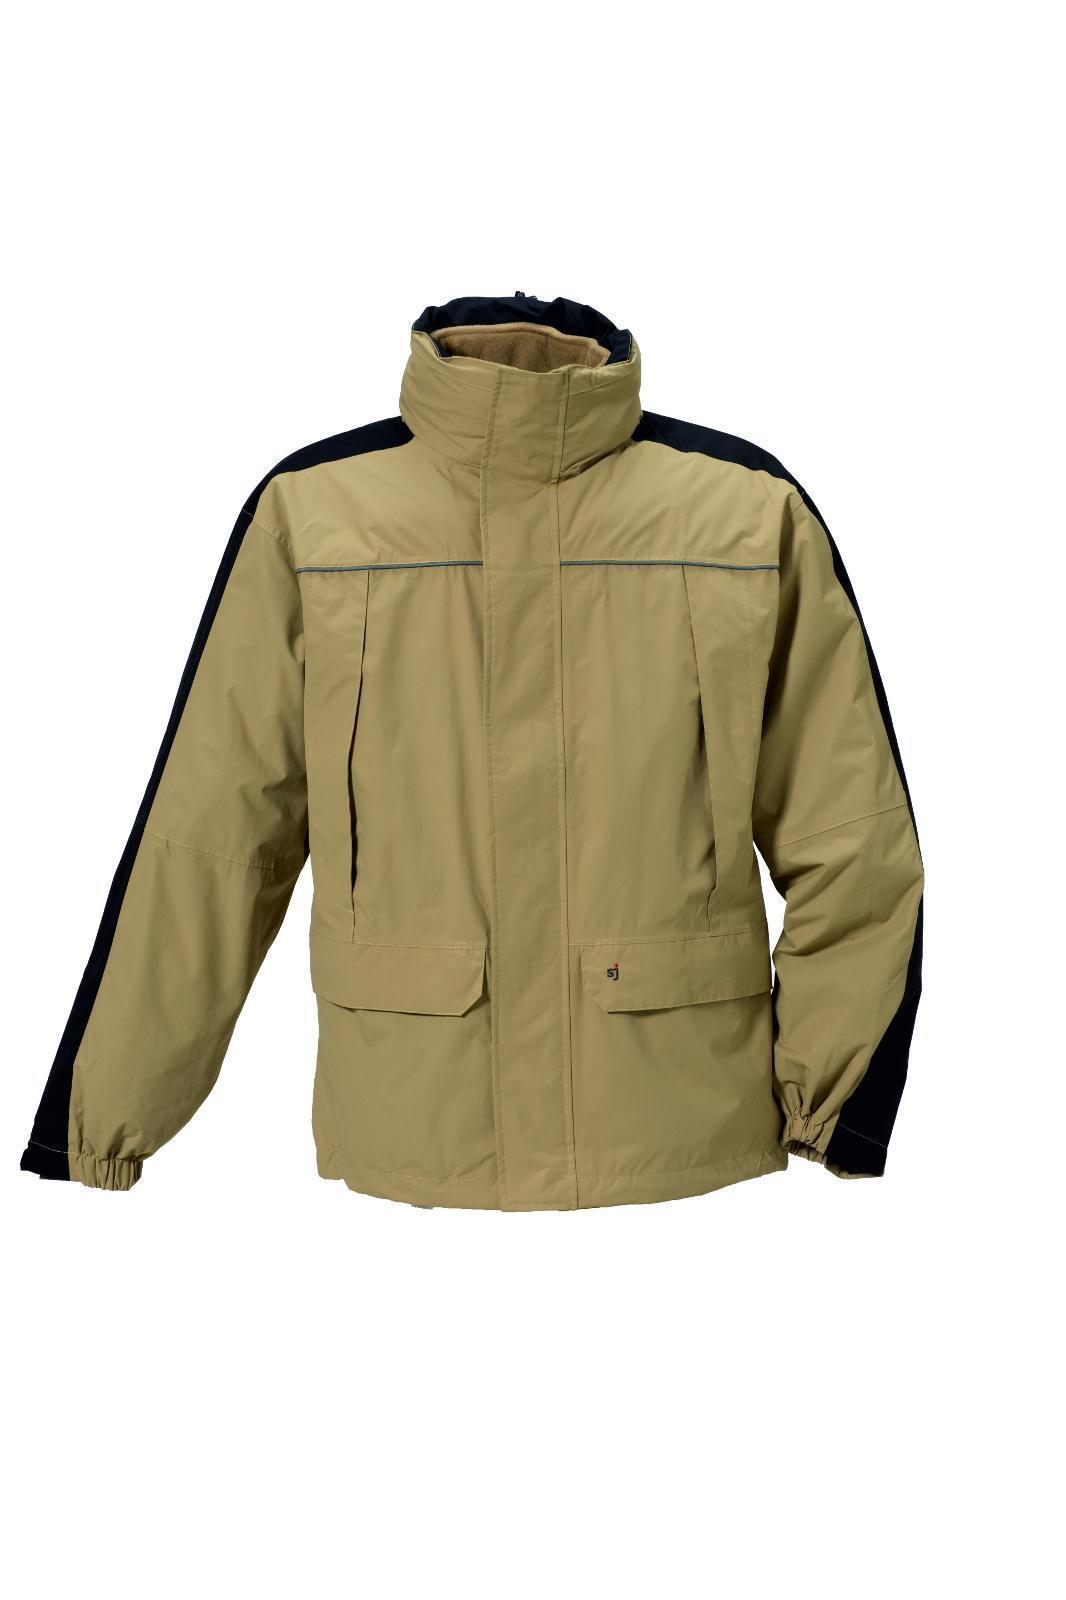 SJ función chaqueta j409 caqui negro Al aire libre caballeros 3in1 chaqueta con innenfleece